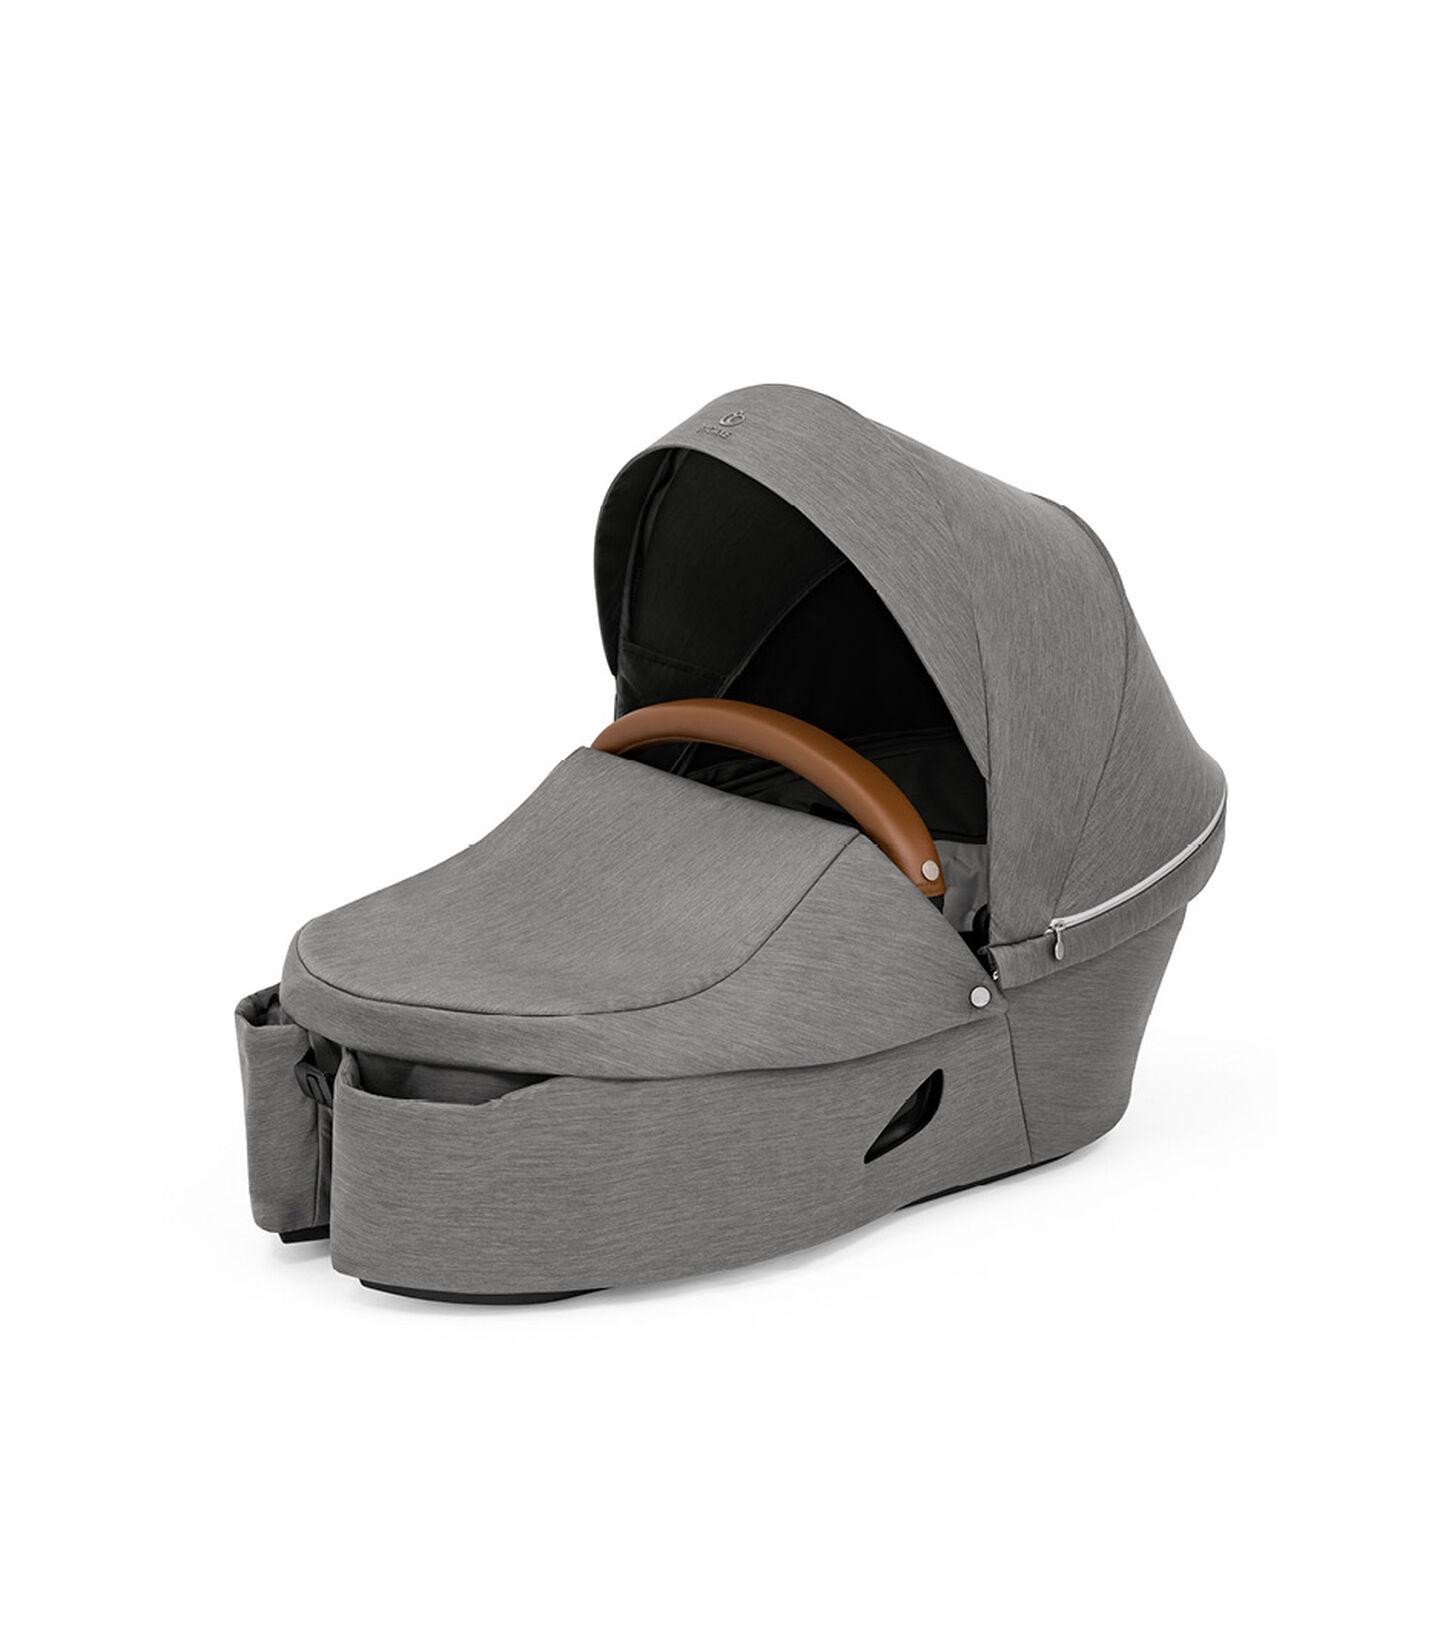 Stokke® Xplory® X Carry Cot Modern Grey, Modern Grey, mainview view 2